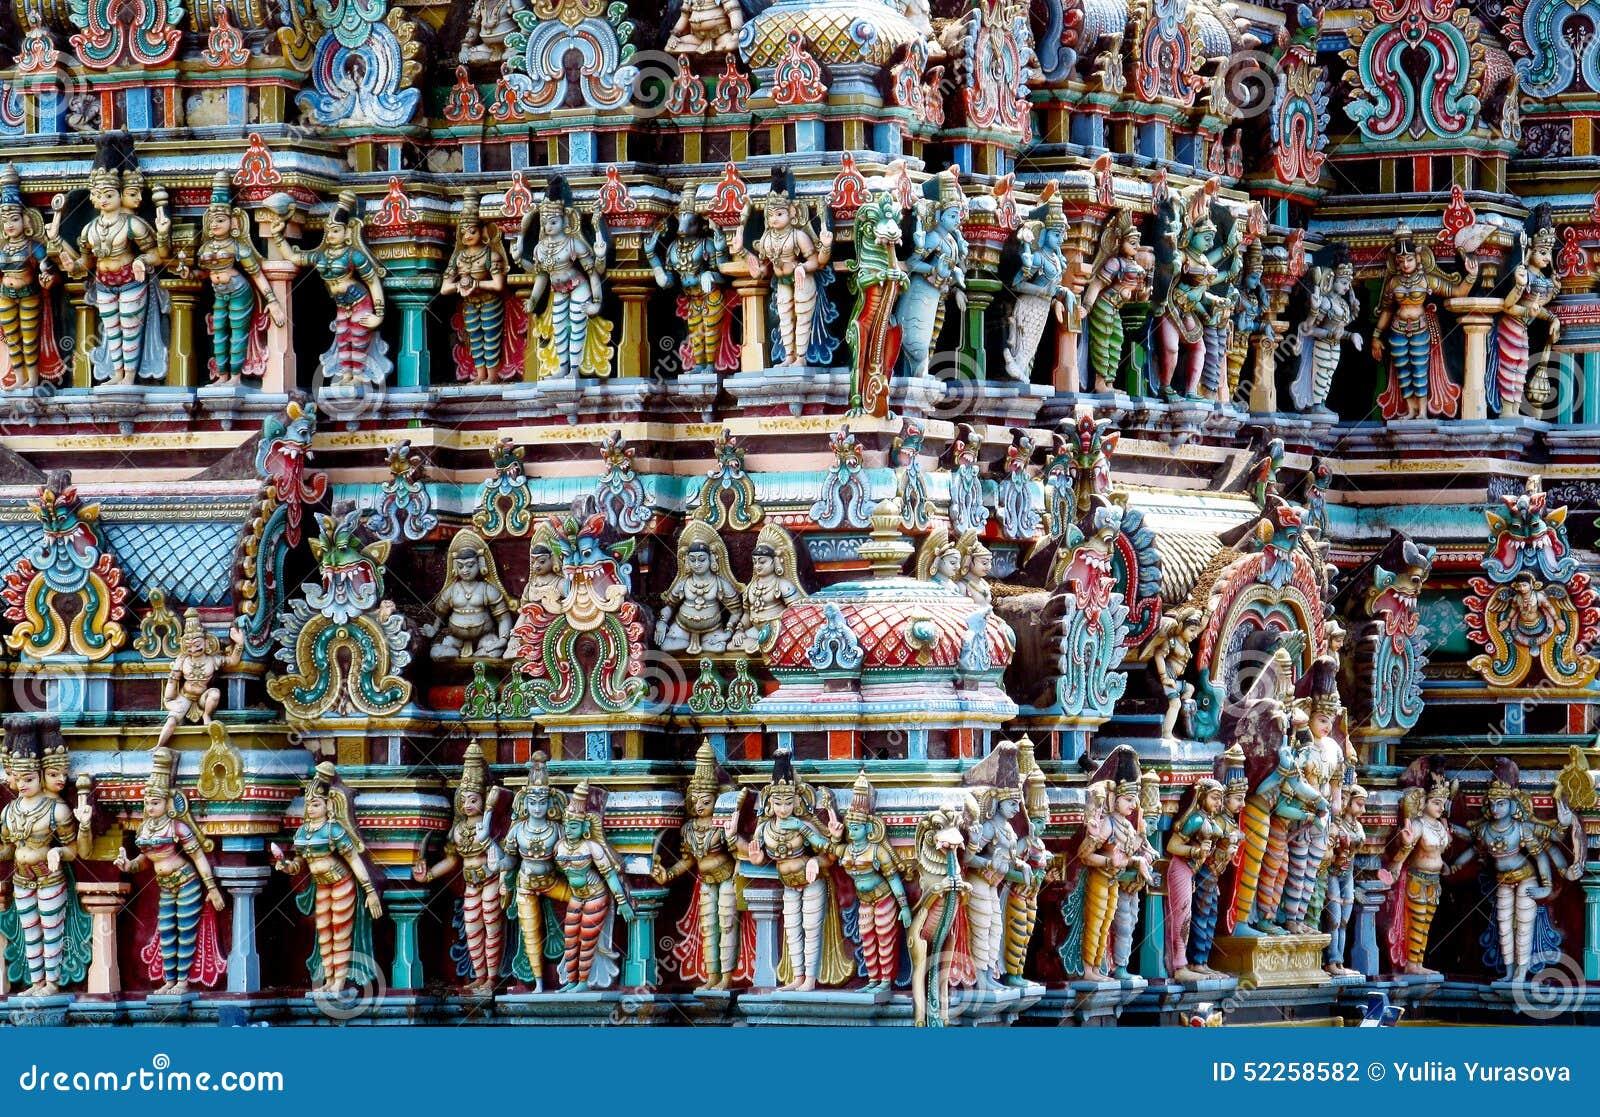 Hindu colorful Gods statues on a gopuram in India